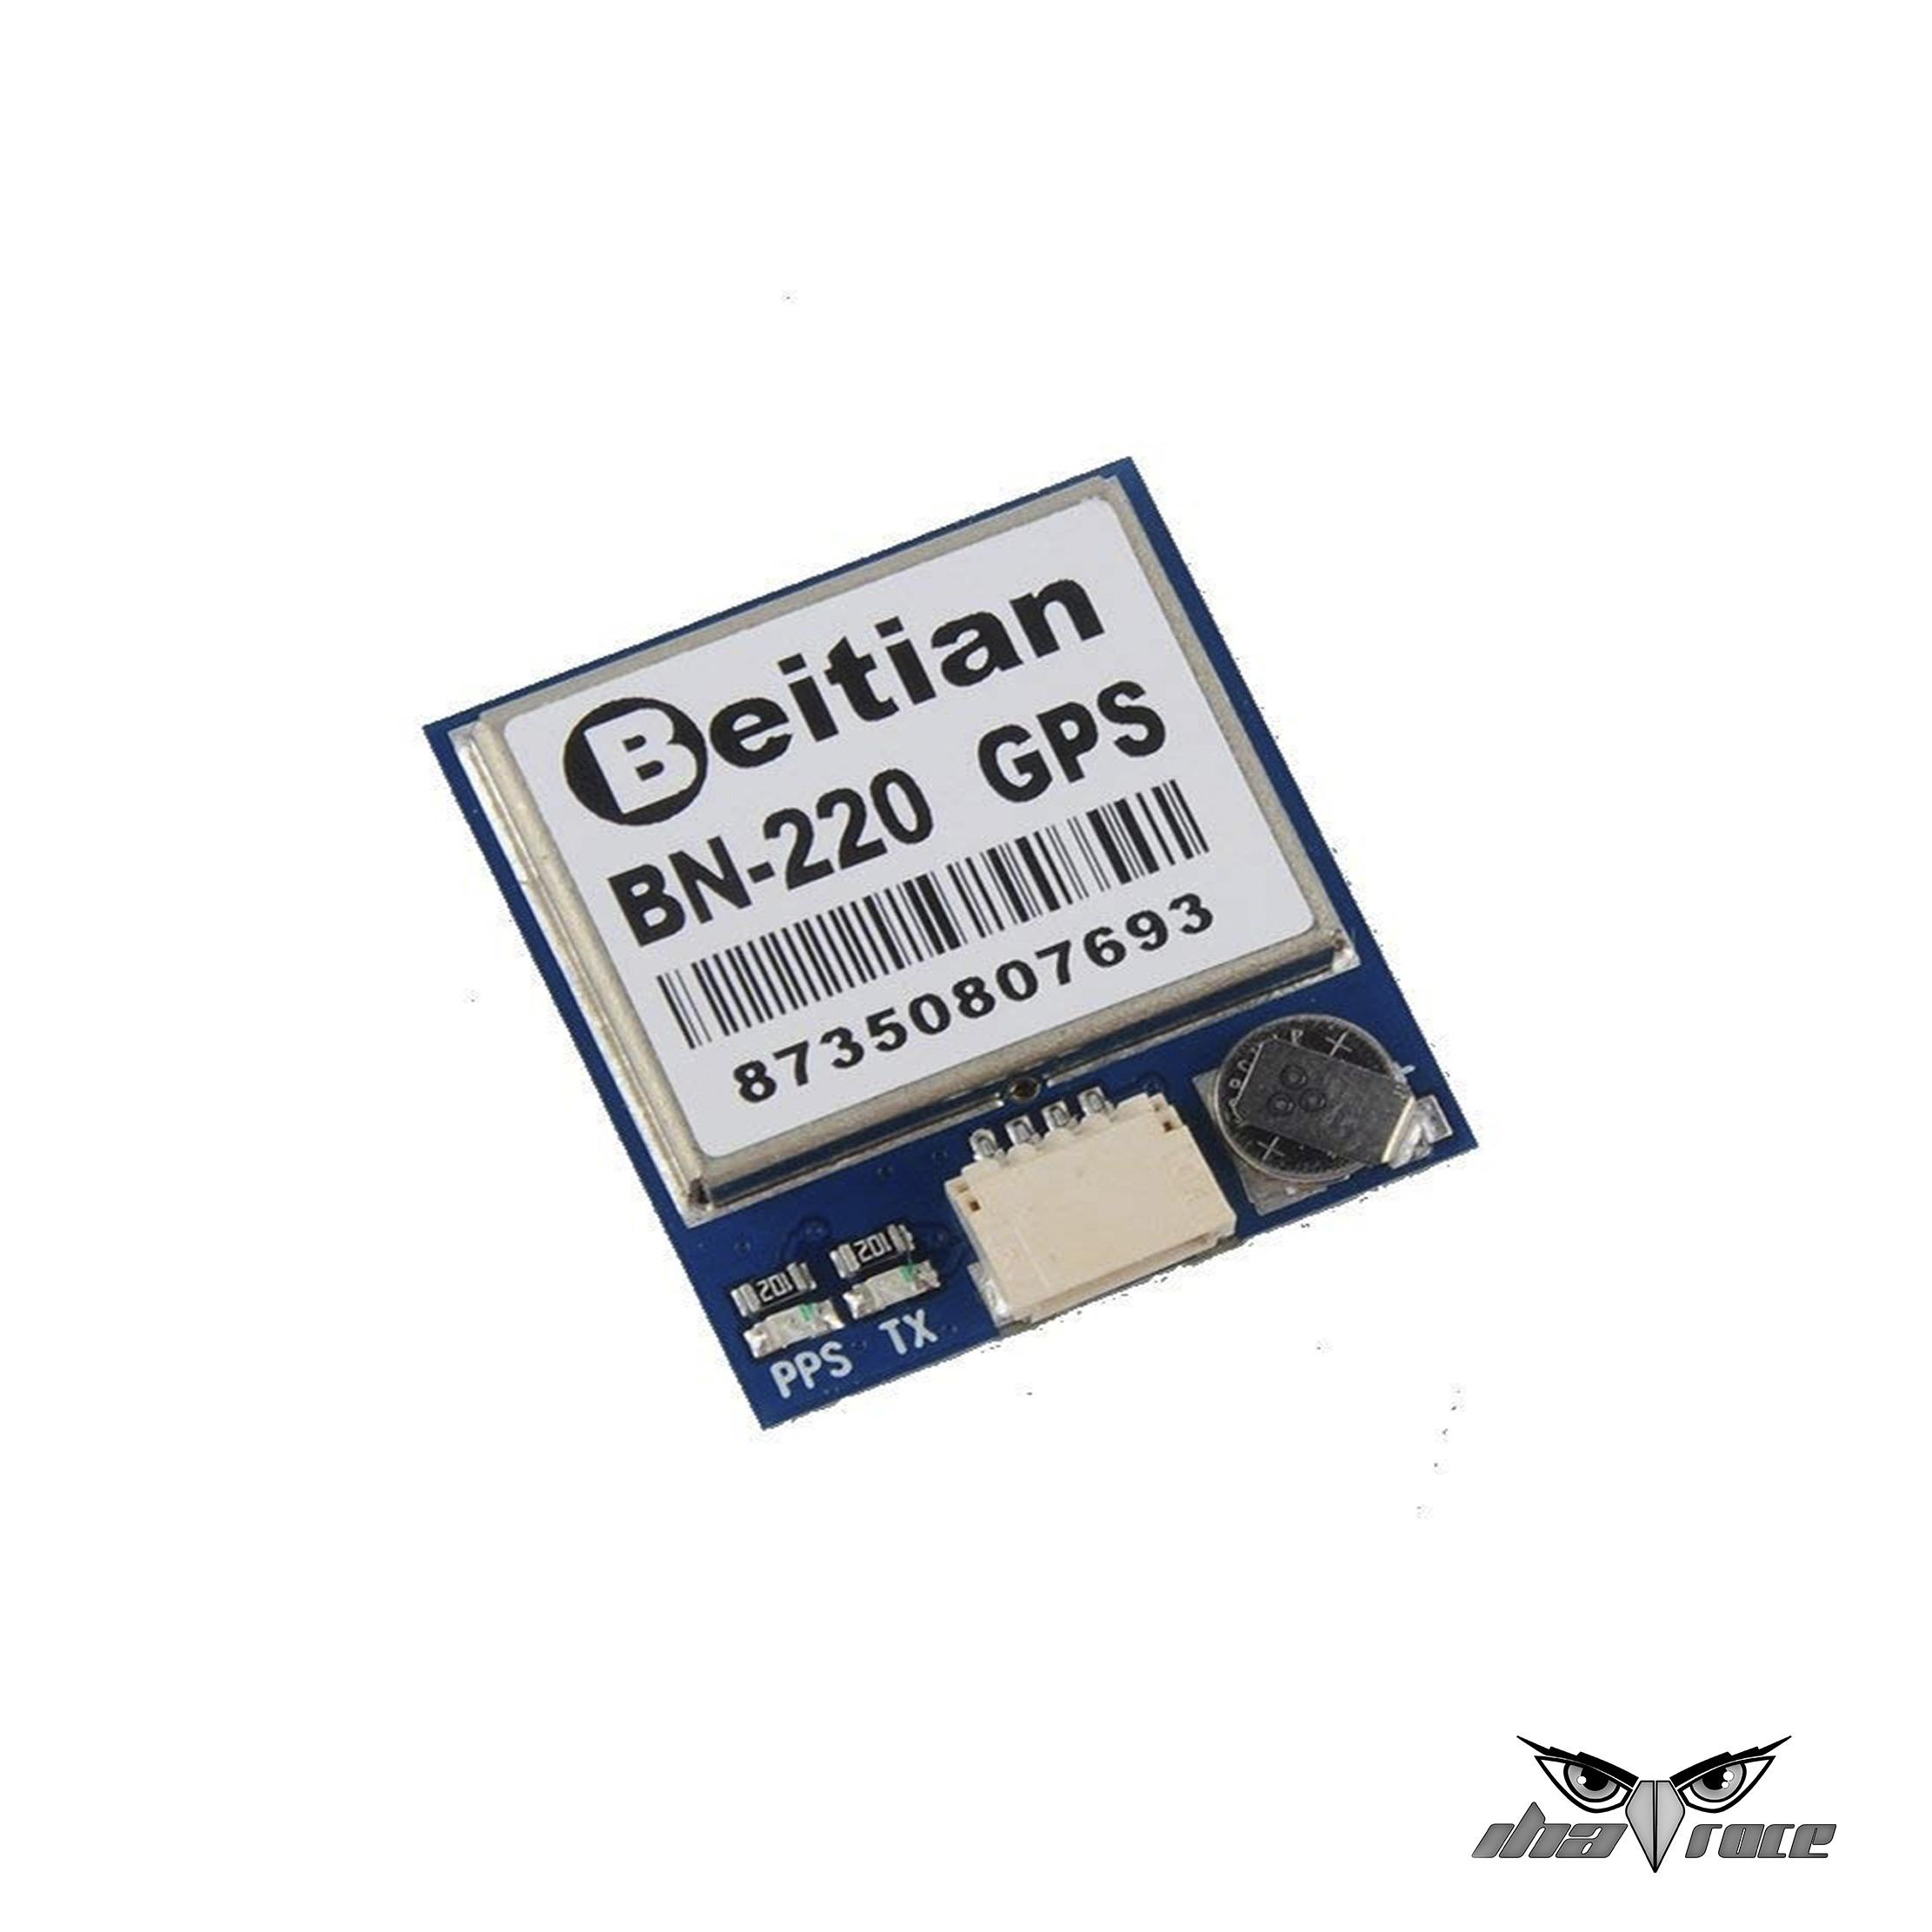 Beitian GPS BN-220 Dual Glonass